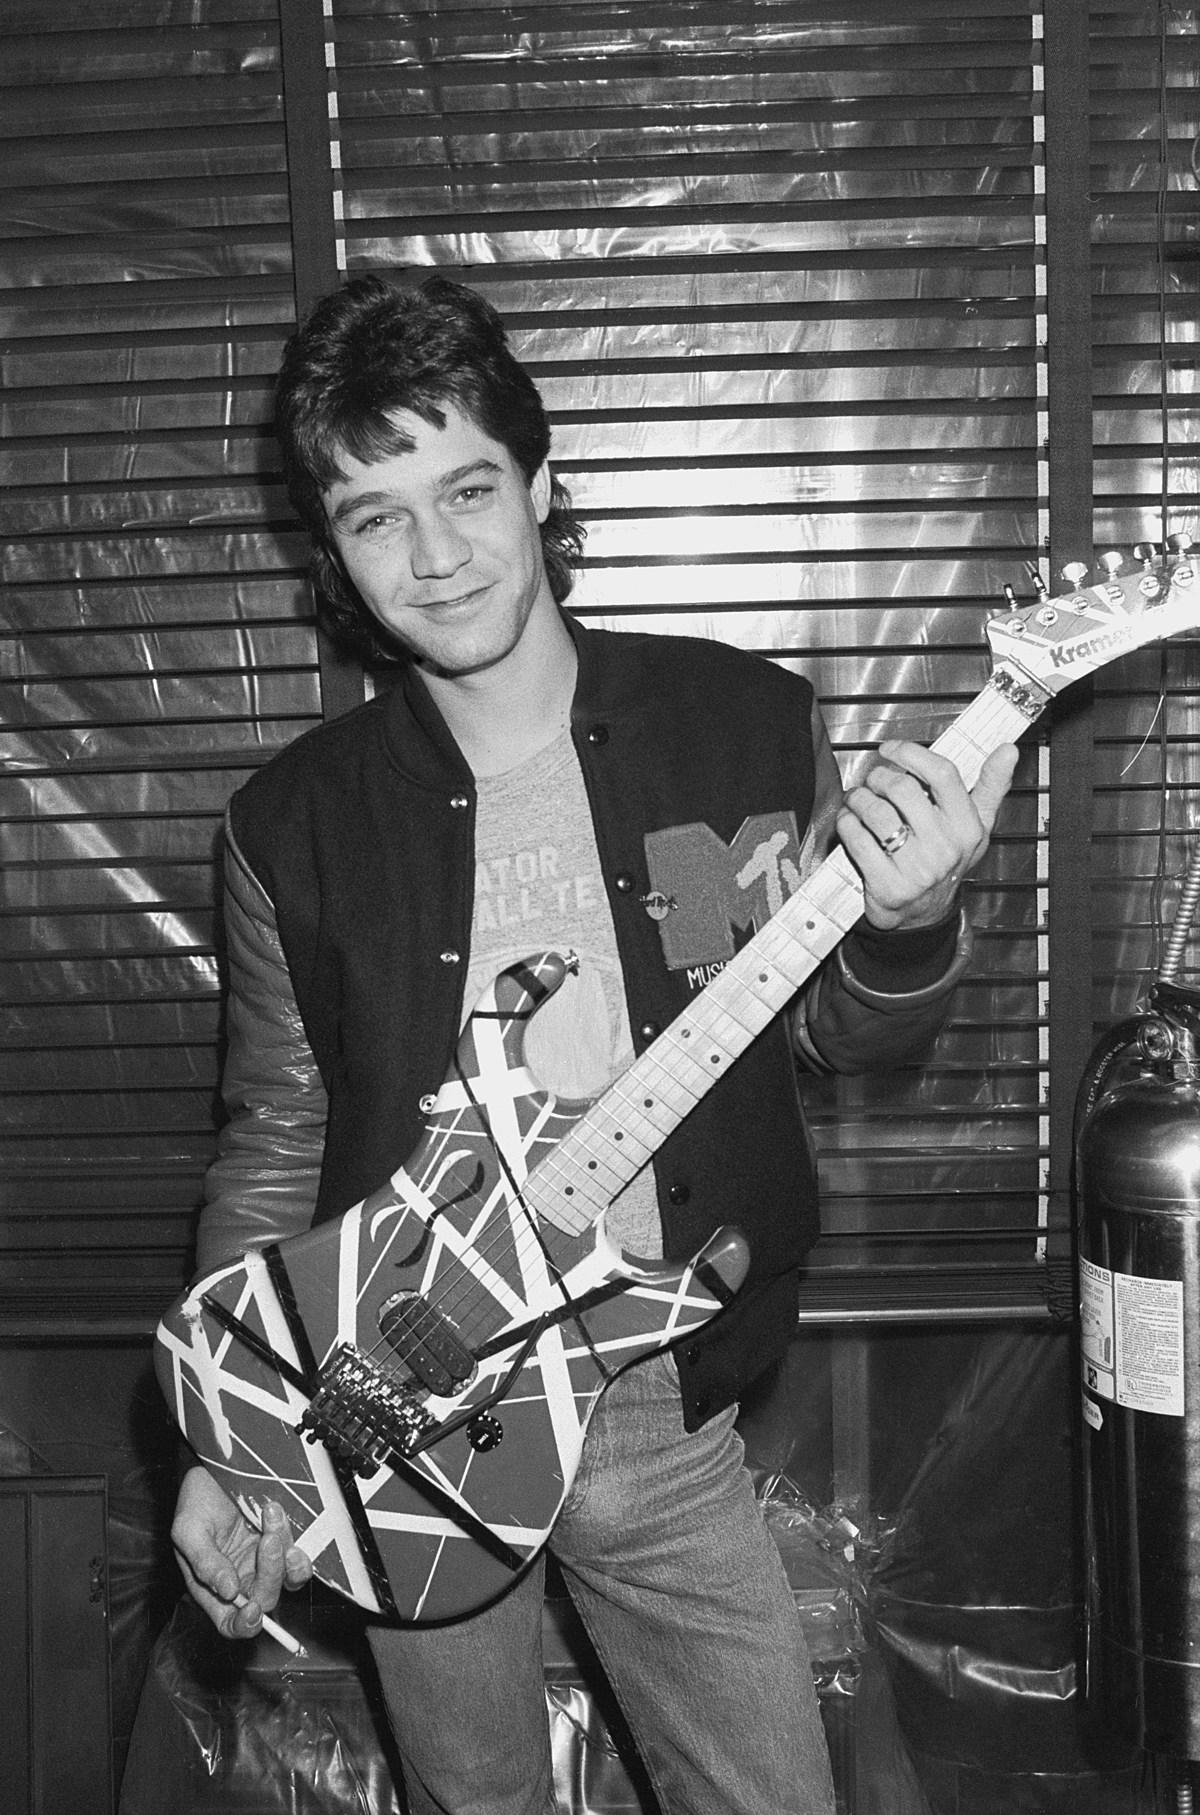 Miniature Eddie Van Halen Guitars Available